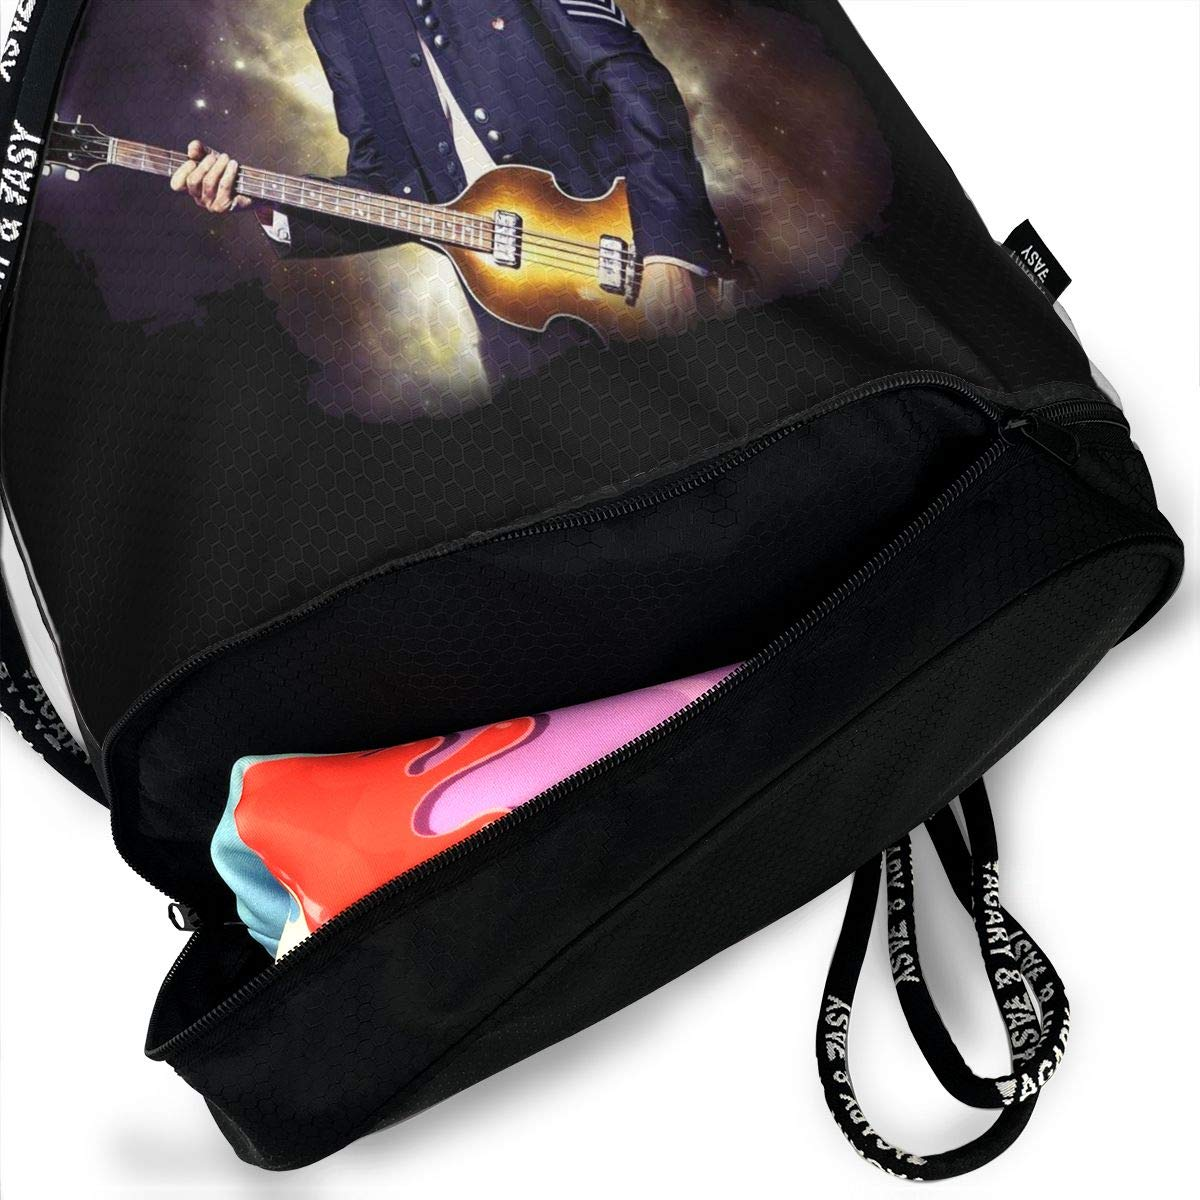 DIDhsswuz Paul-McCartney Unisex Drawstring Backpack Drawstring Bag Bundle Backpack Yoga Bag